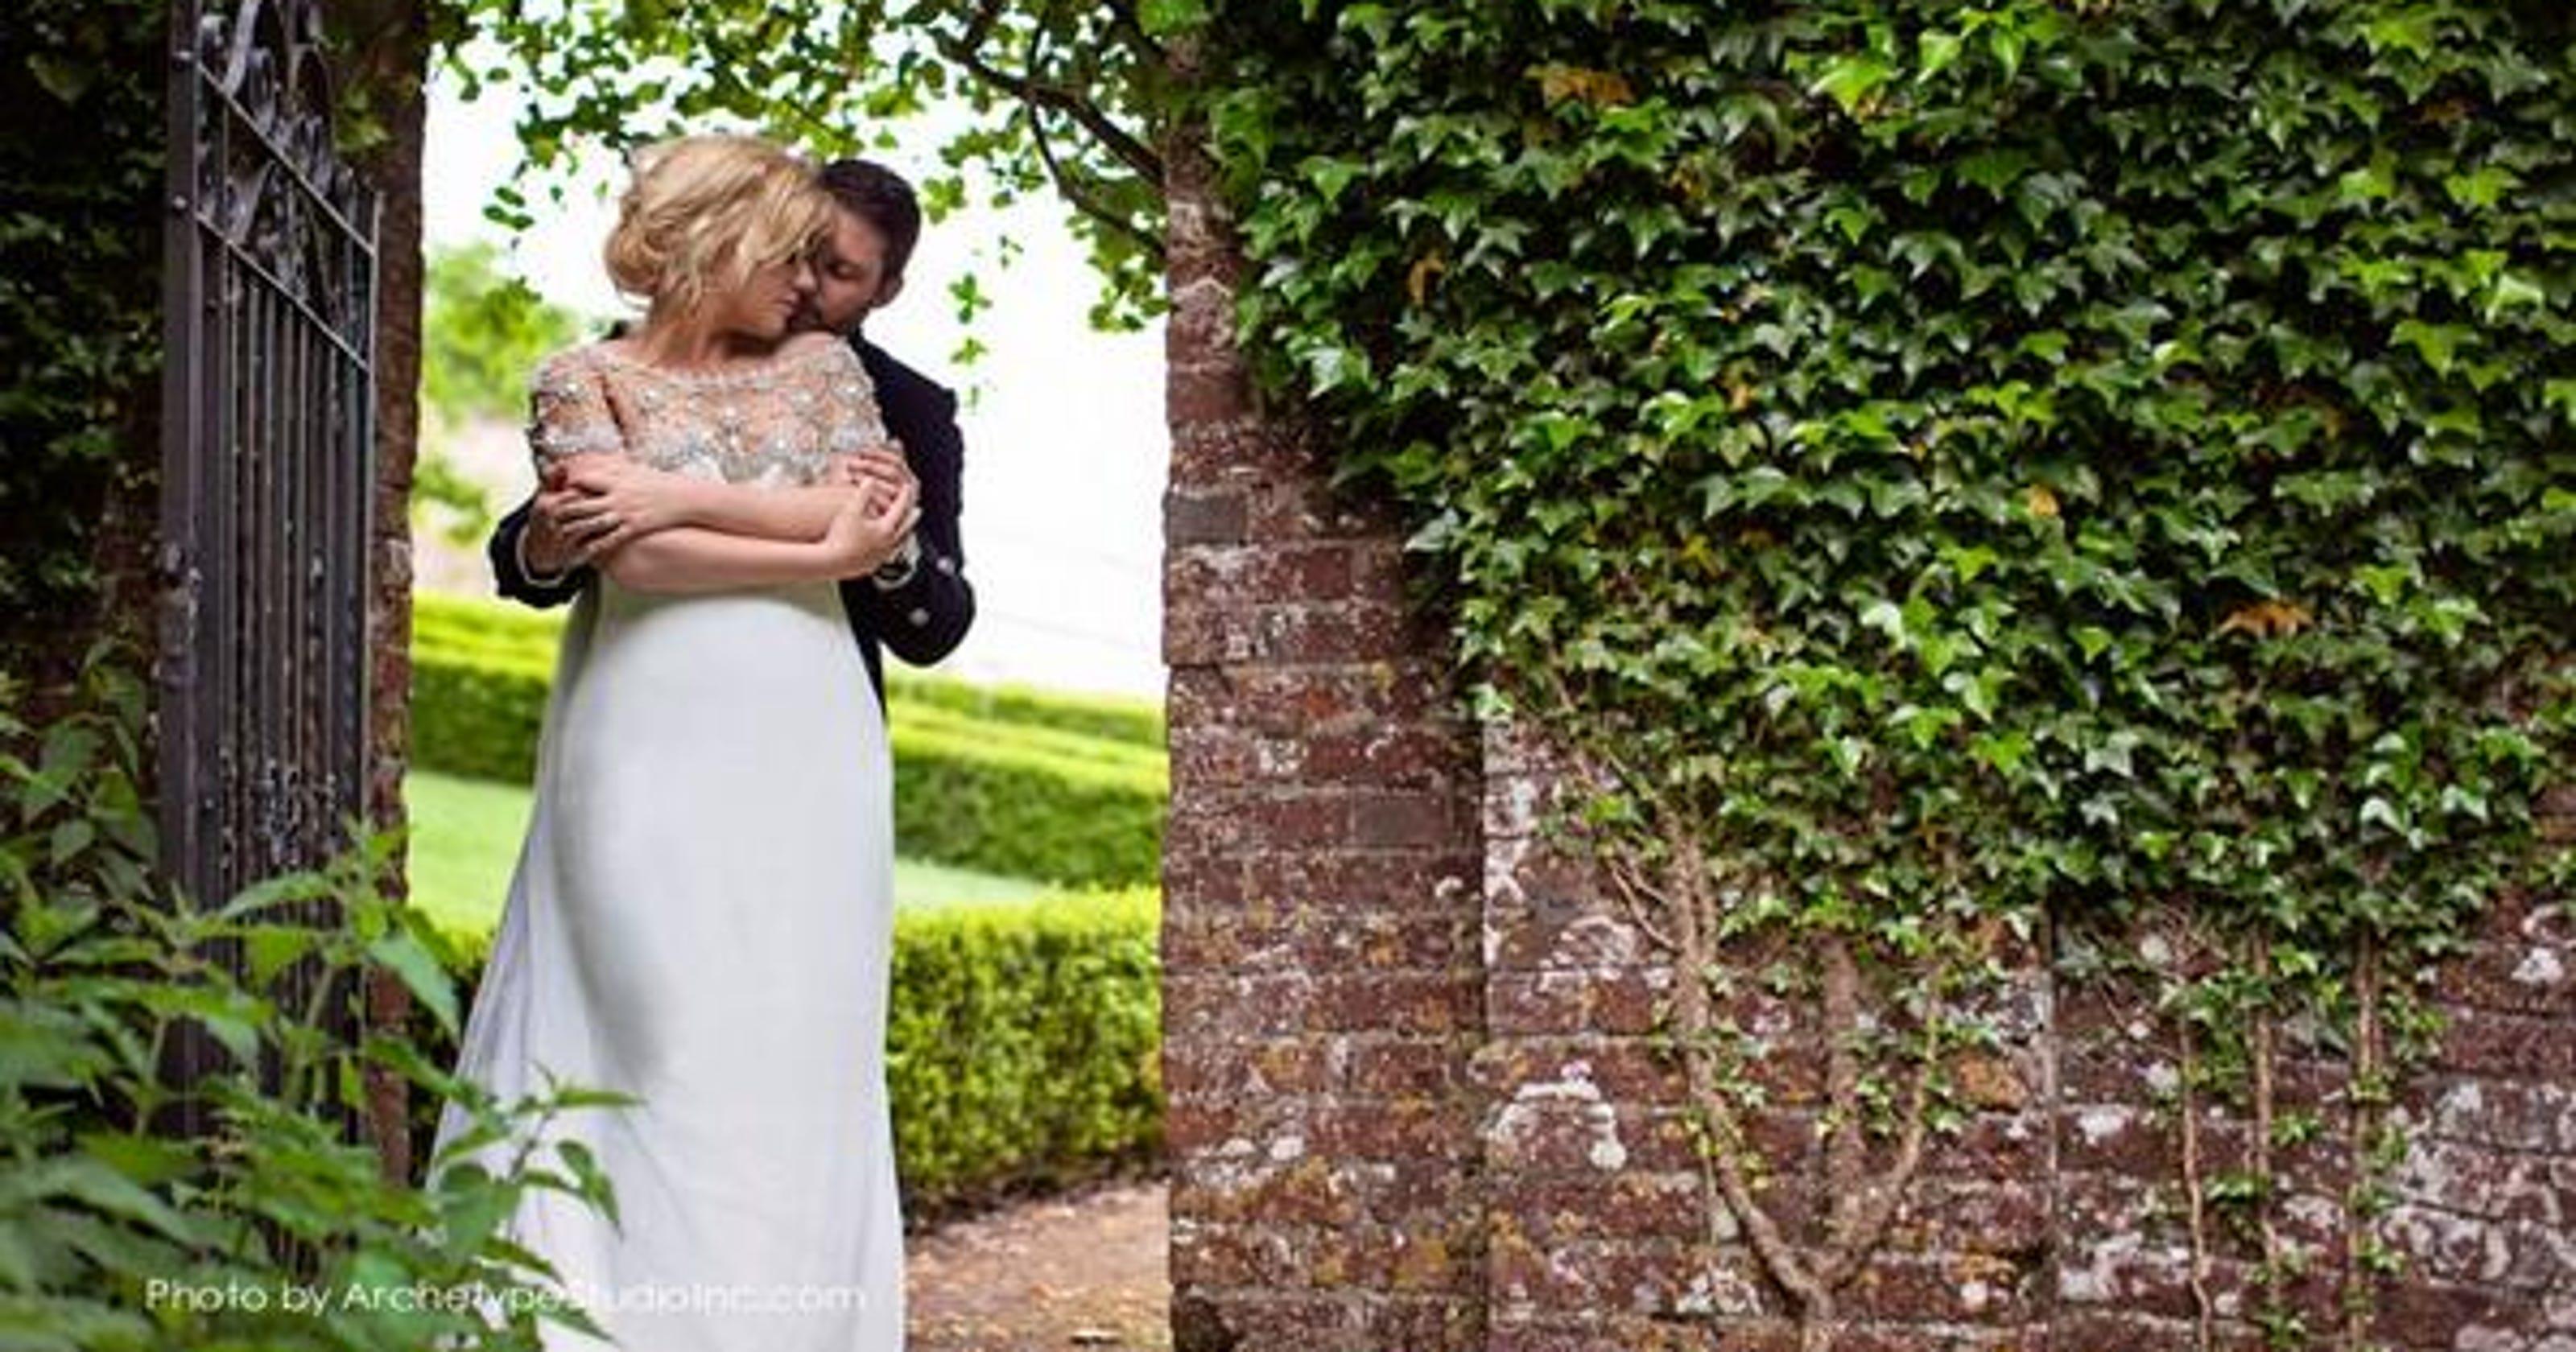 Kelly Clarkson Wedding.Kelly Clarkson Scraps Big Wedding Plans